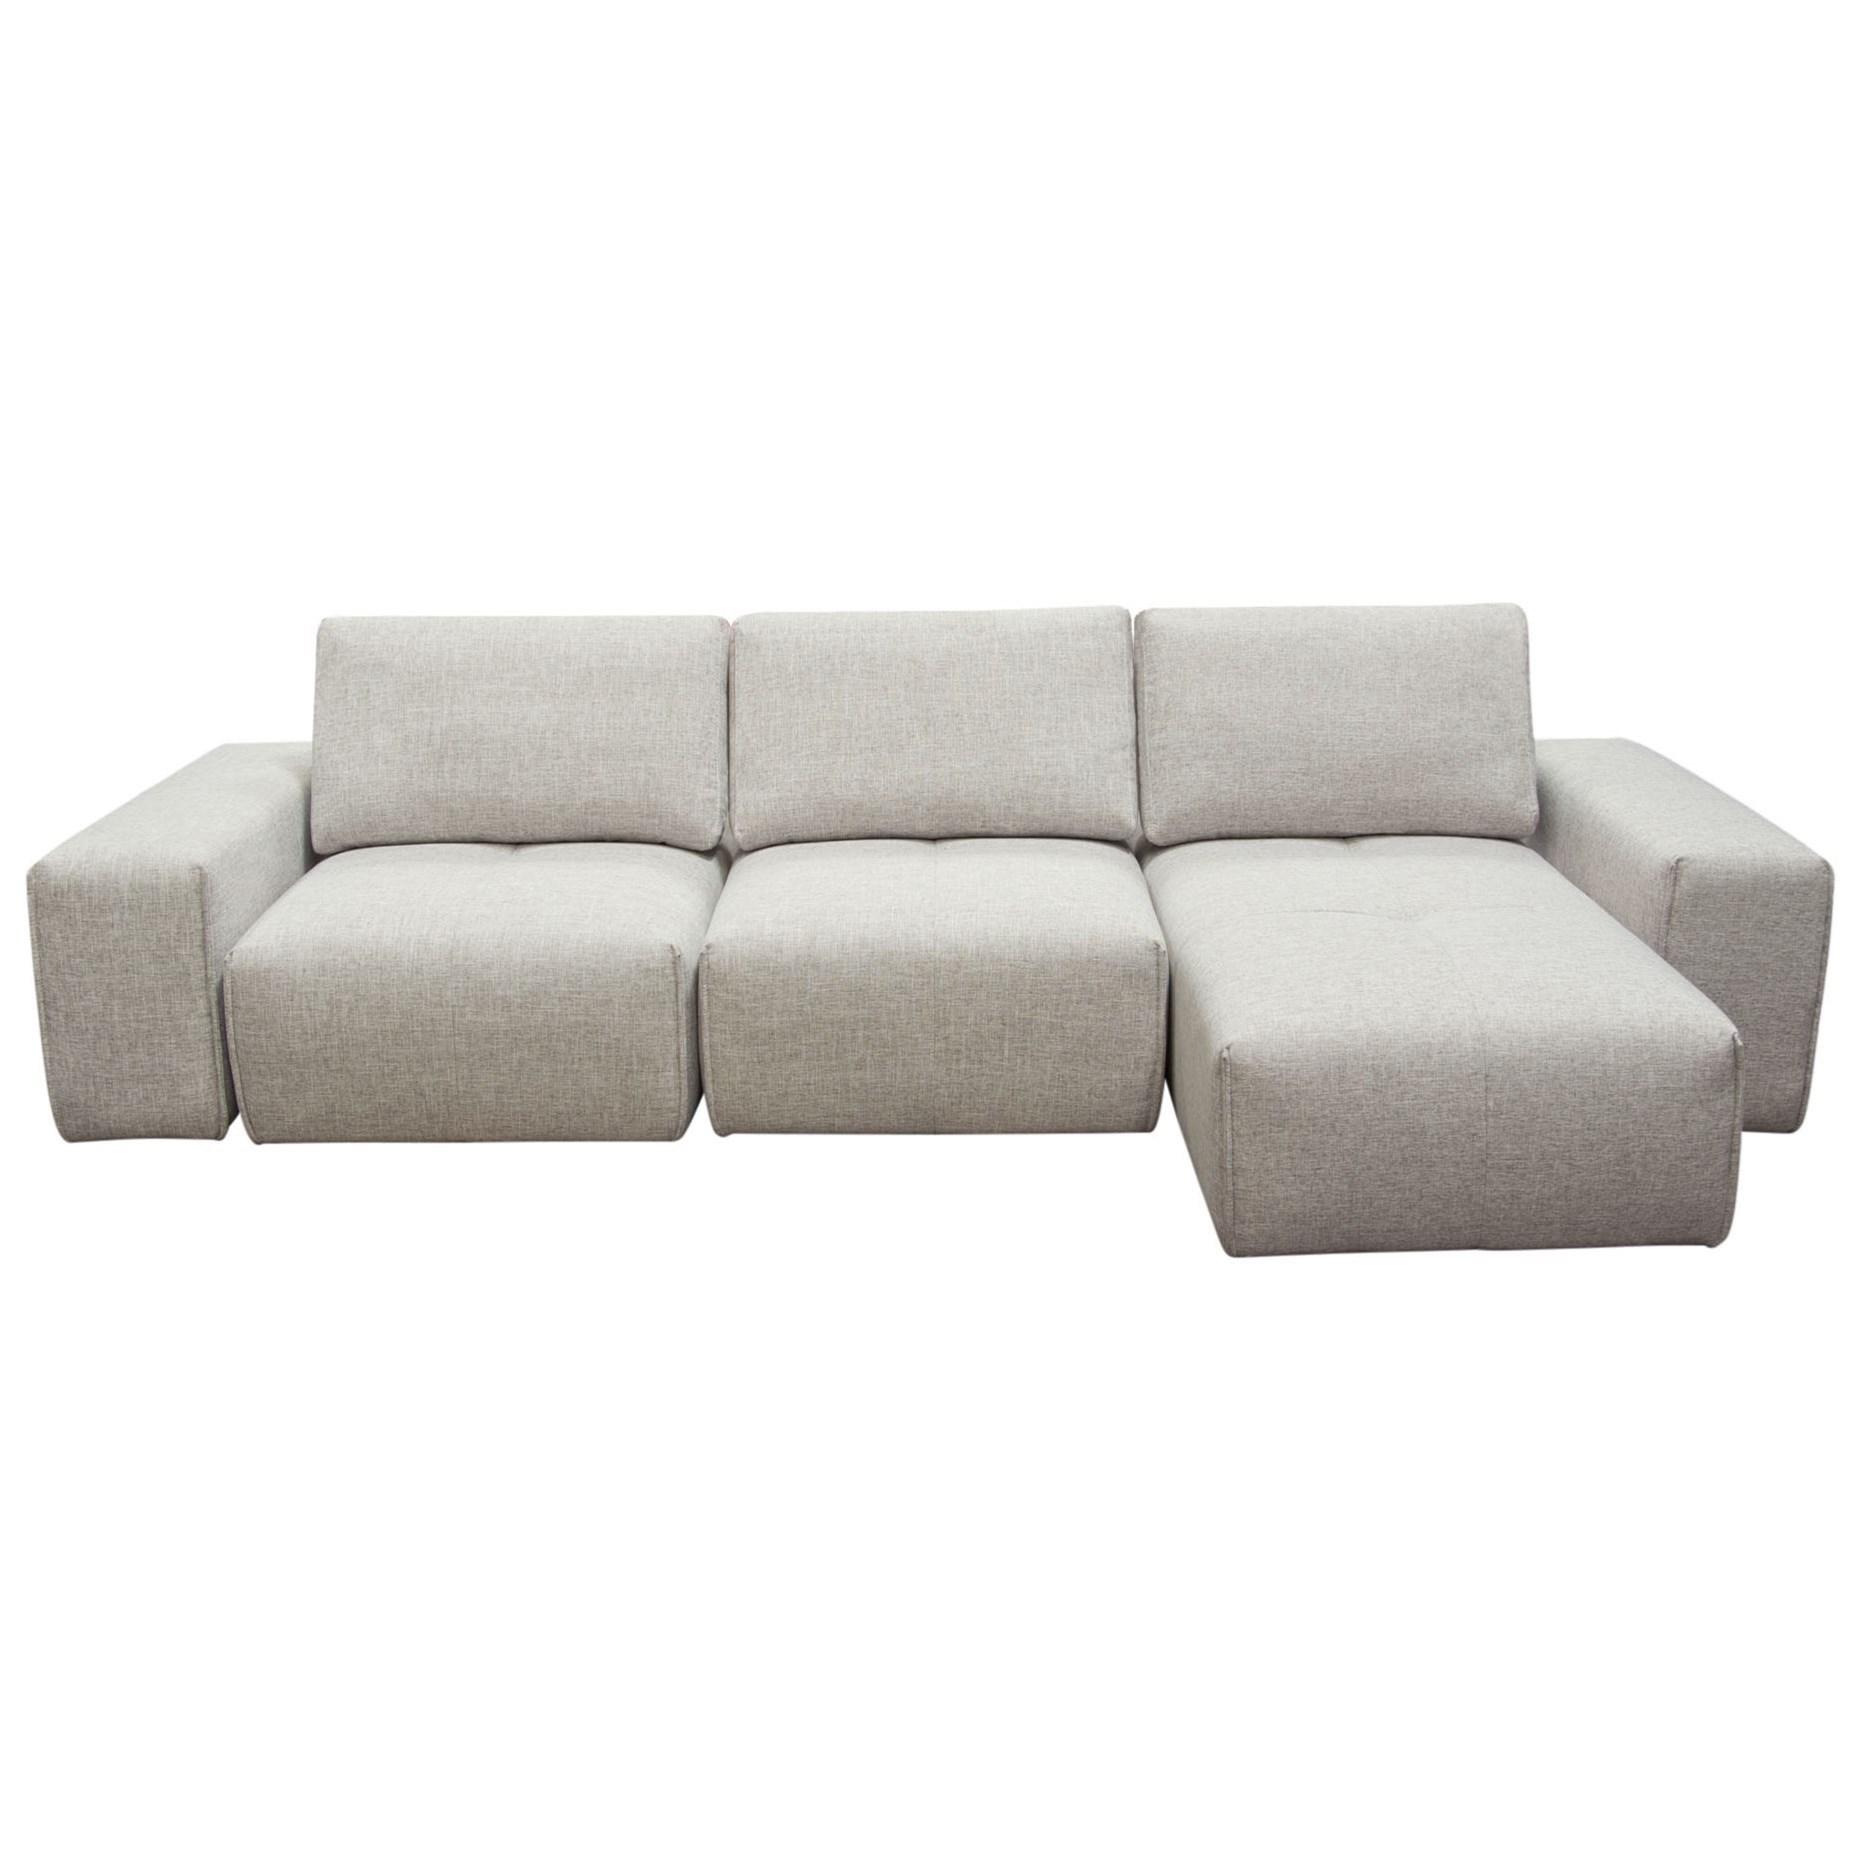 Superieur Diamond Sofa JazzSectional ...